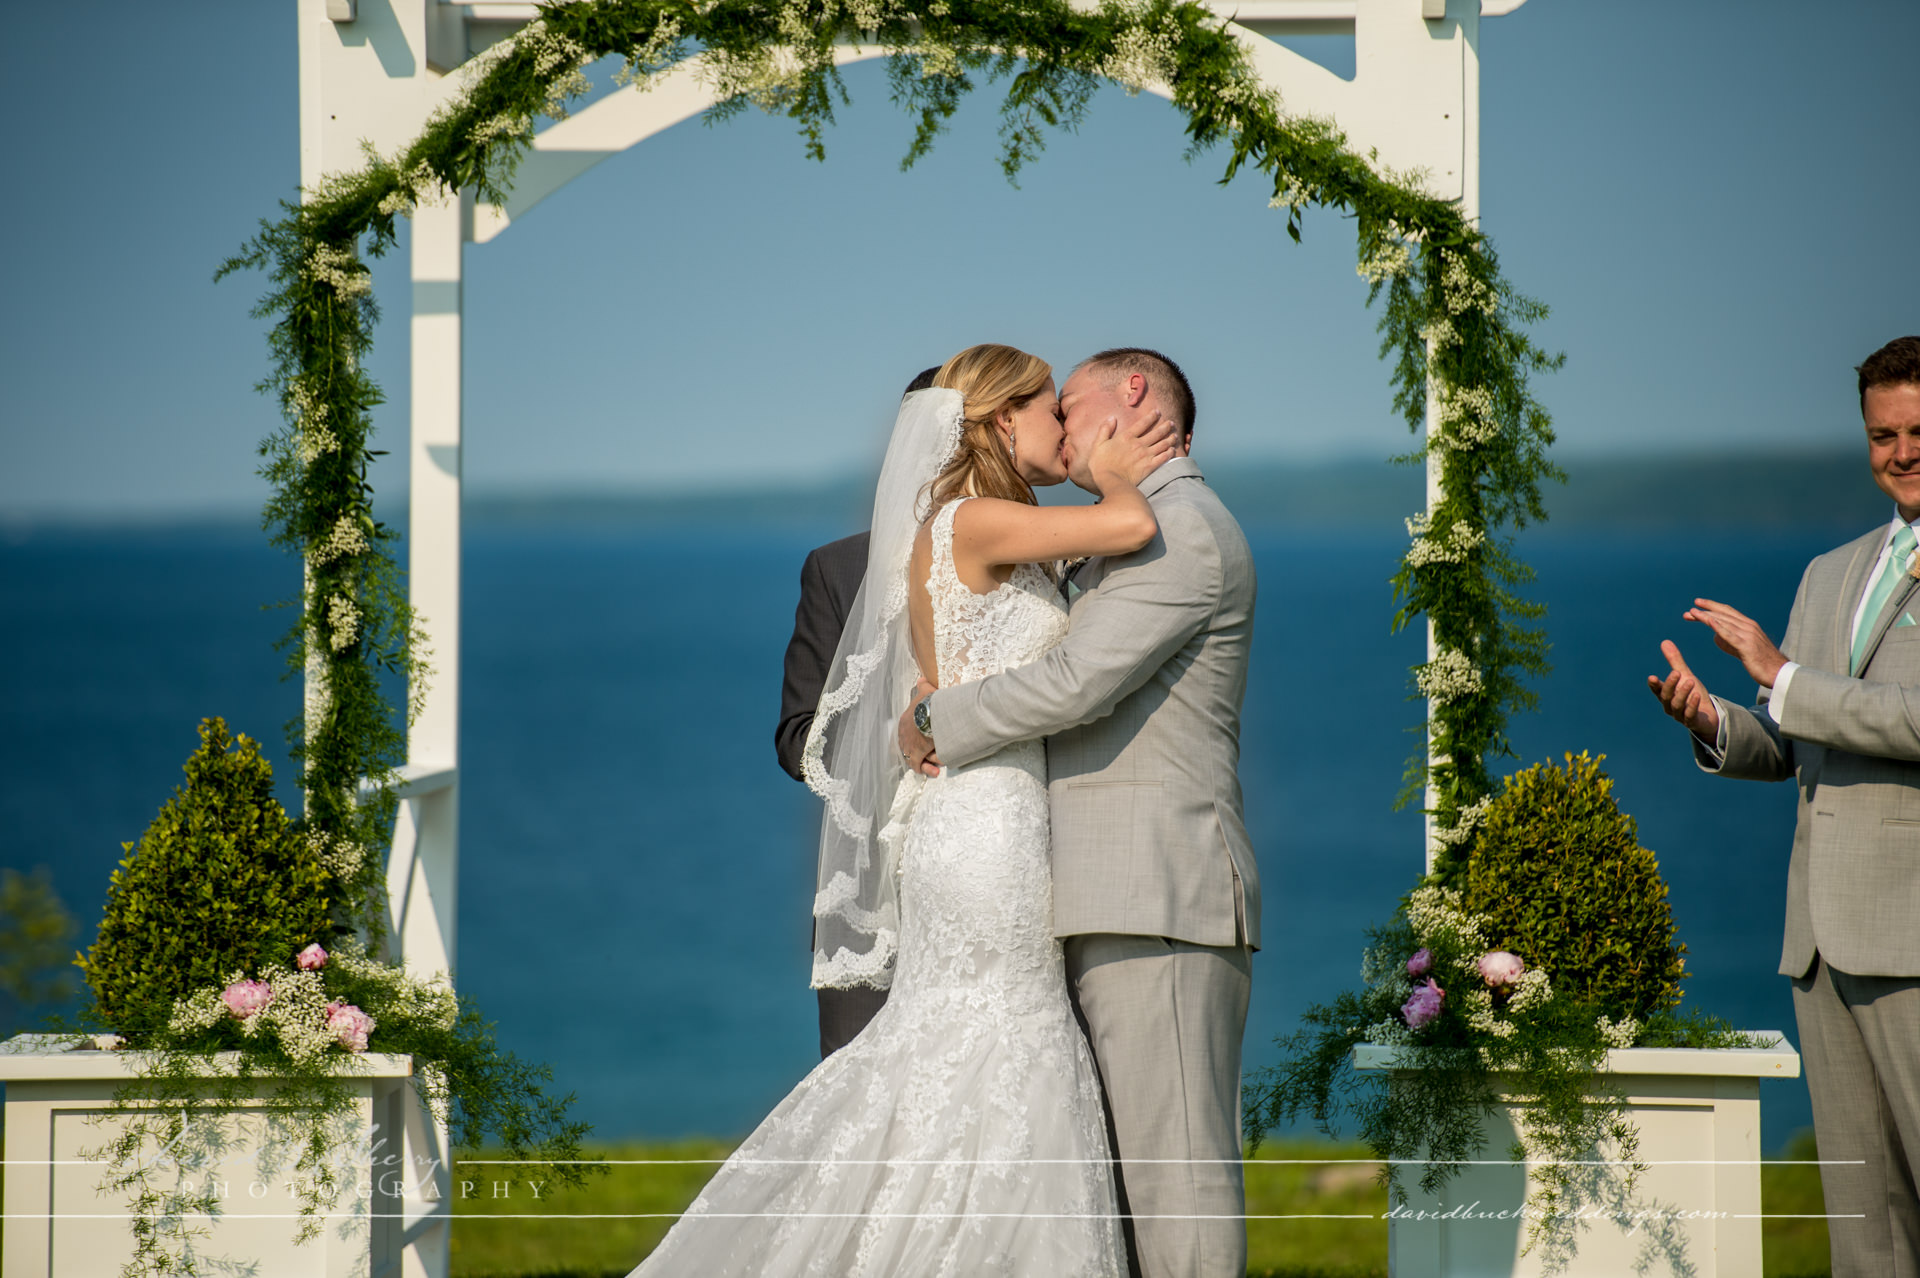 Cobble_Beach_Wedding_Photography_Owen_Sound_27